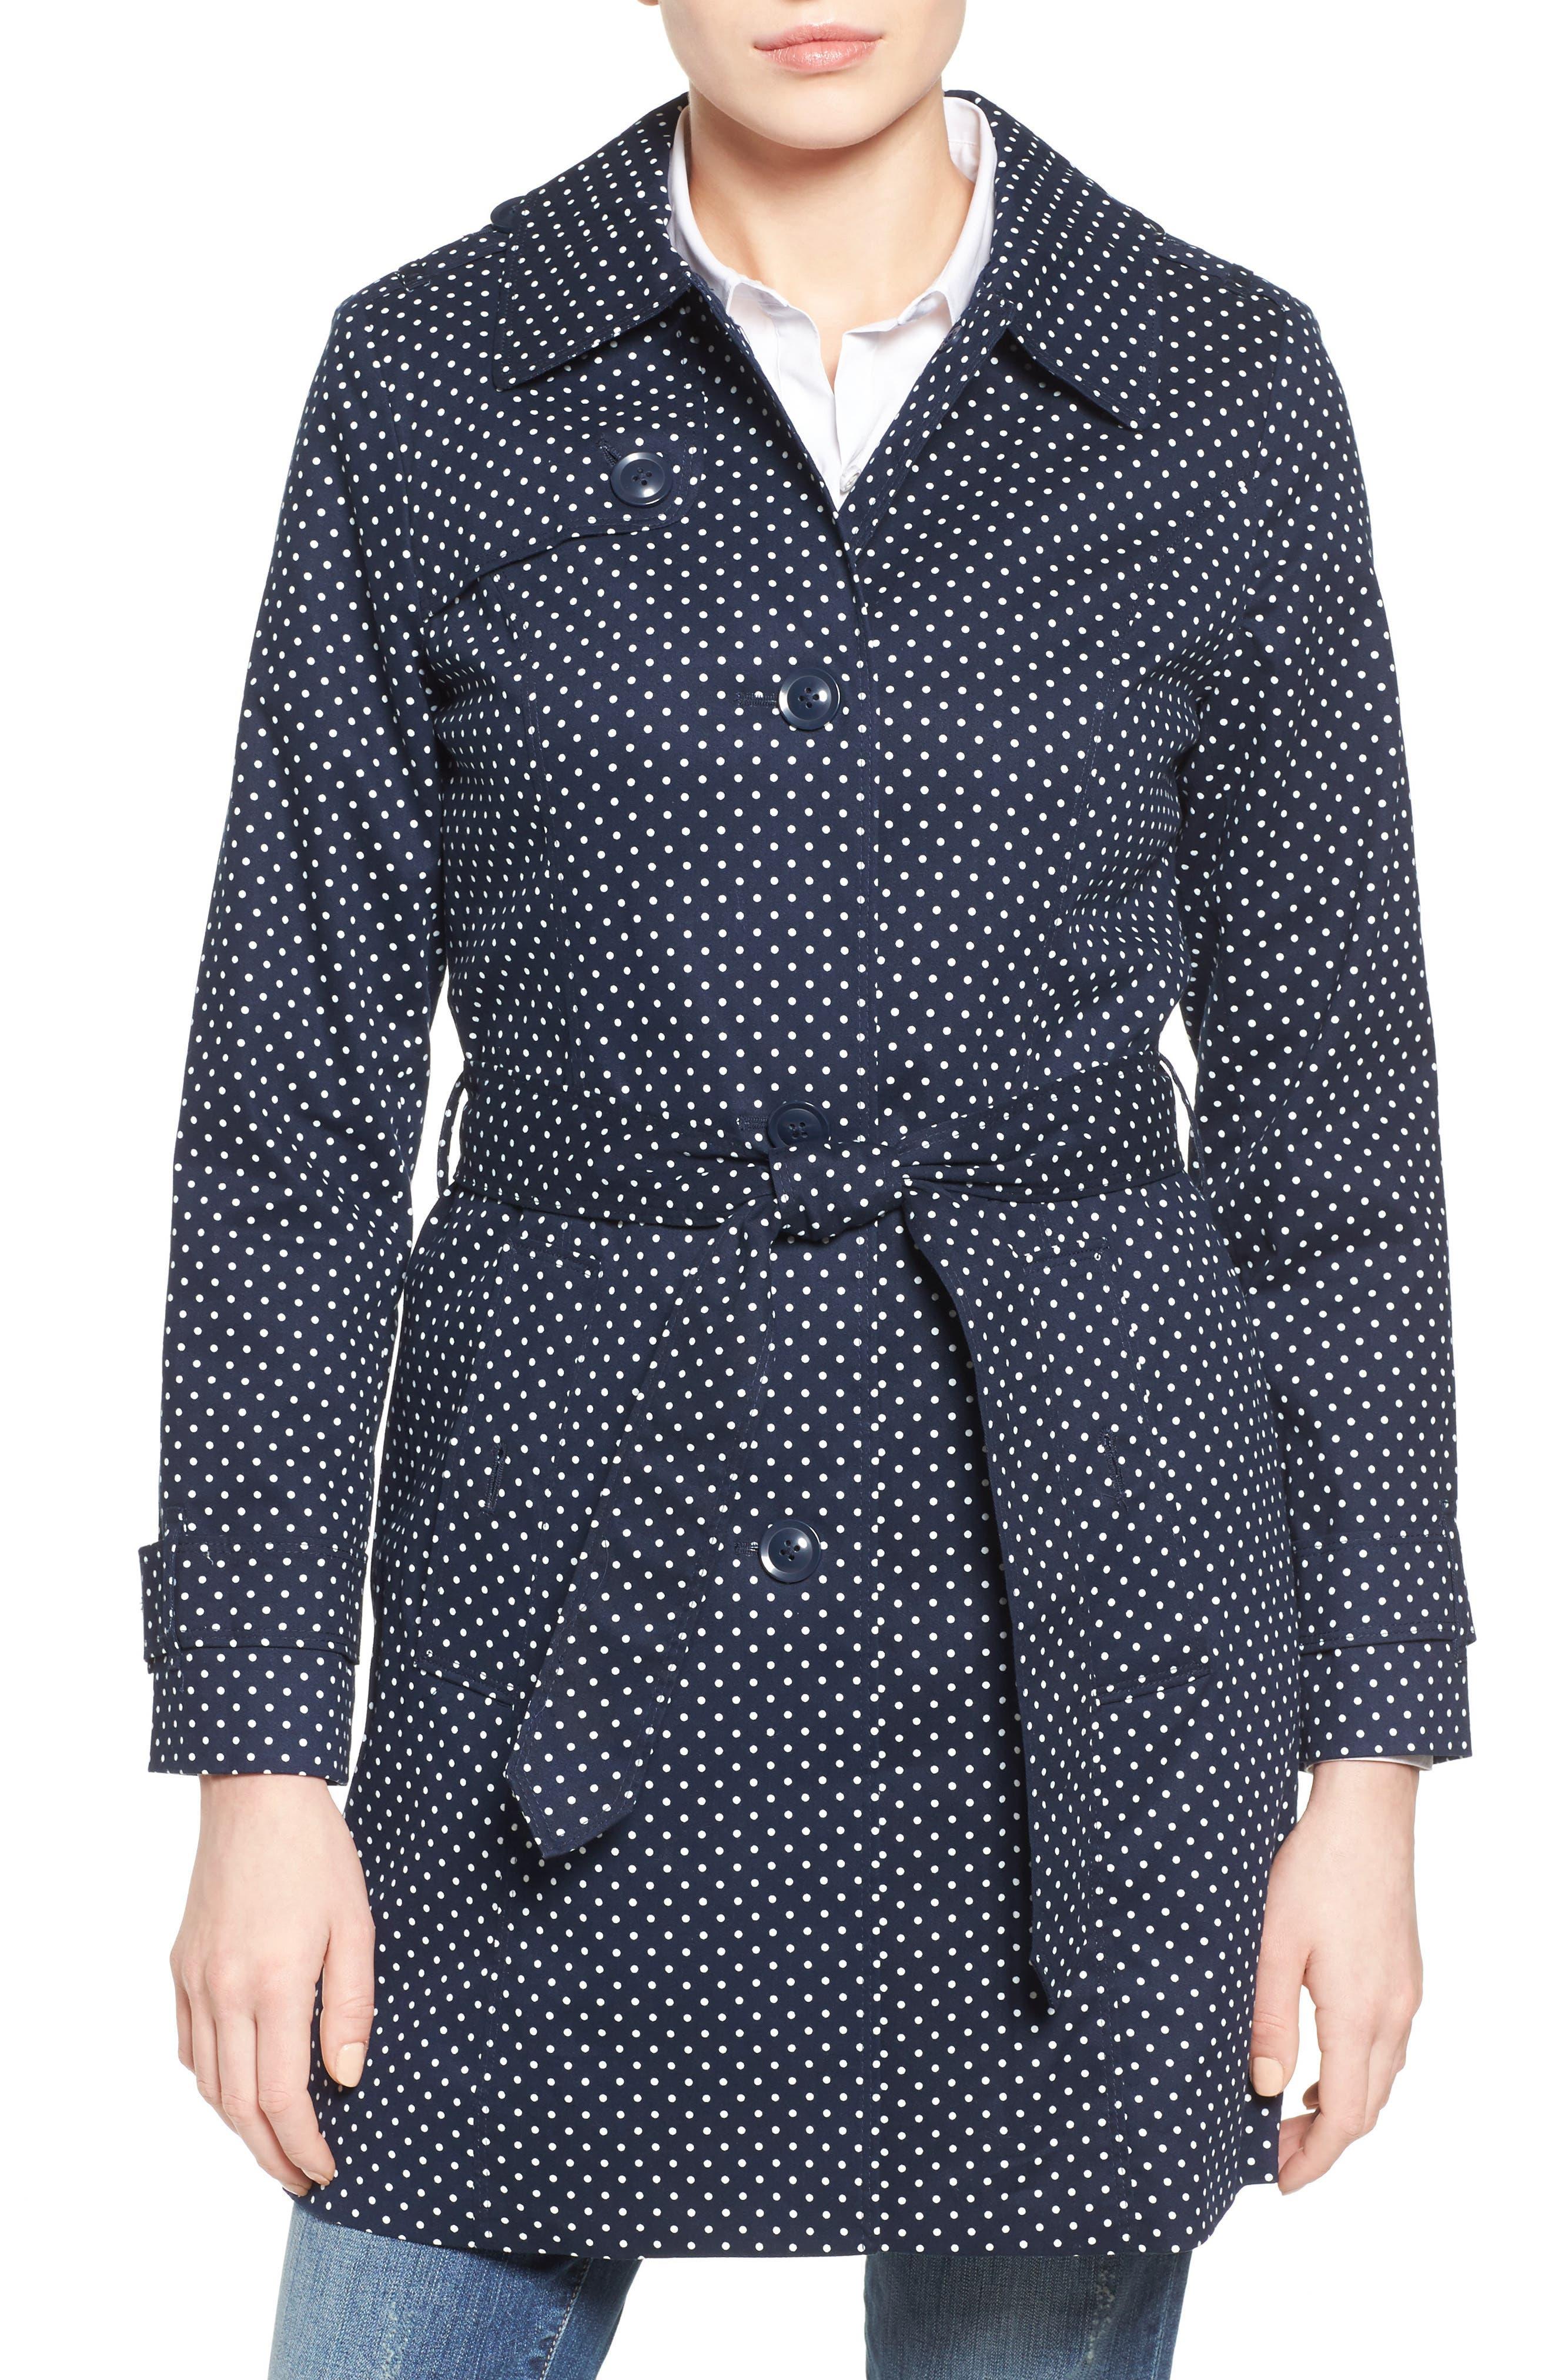 Main Image - London Fog Polka Dot Single Breasted Trench Coat (Regular & Petite)